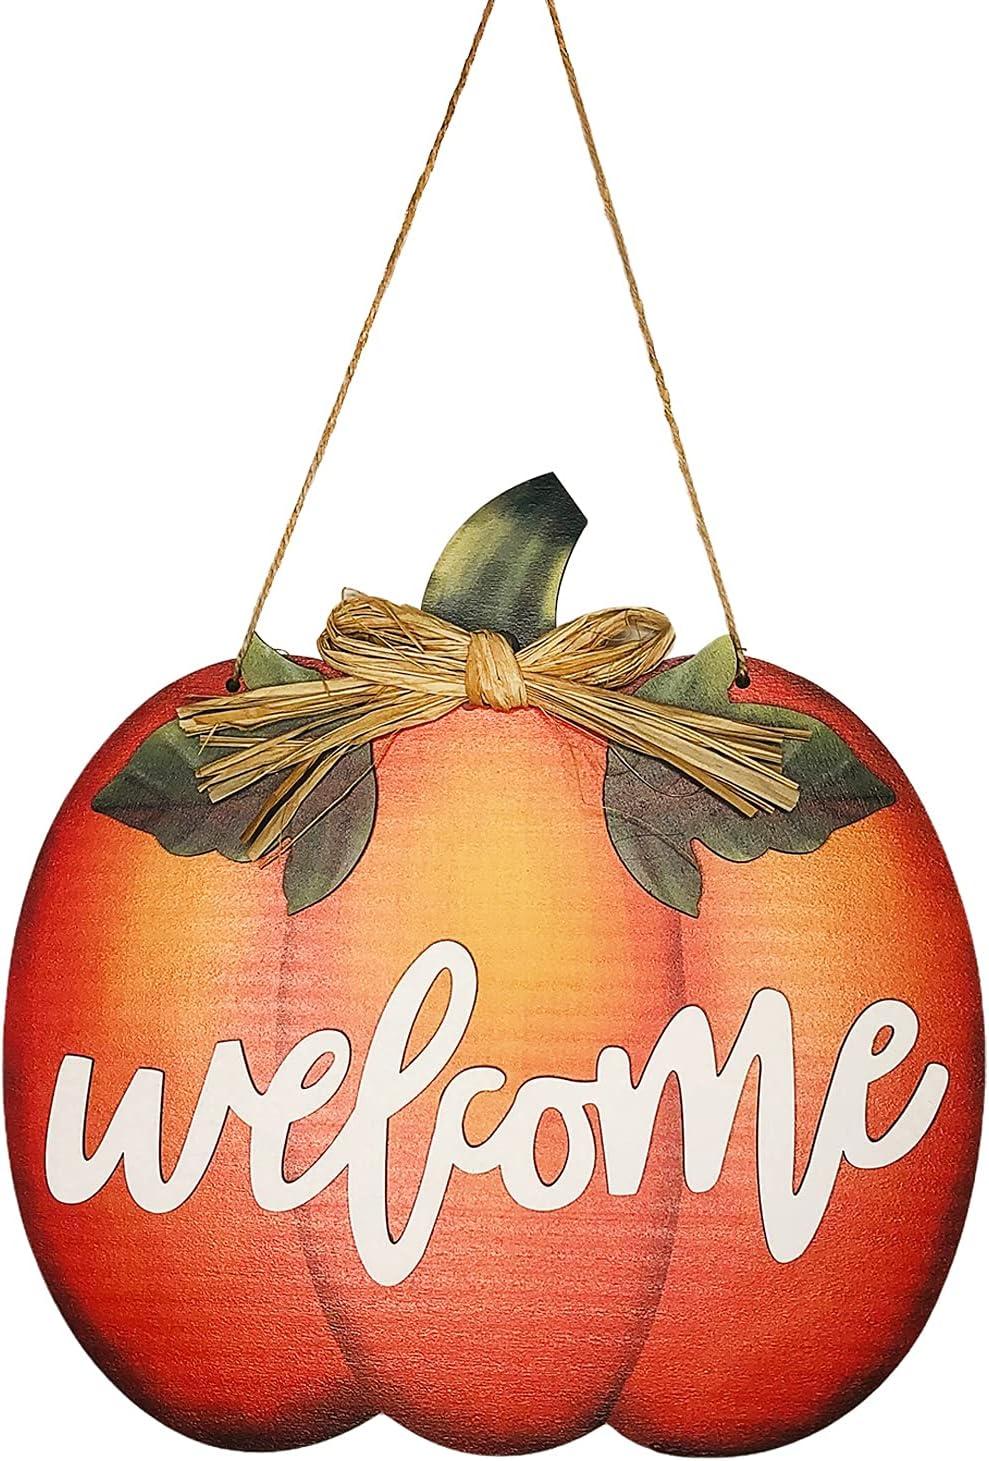 Halloween Pumpkin Welcome Sign- Wood Fall Sign Pumpkin Welcome Sign for Front Door Home Decor- Rustic Door Hanger Wreath for Porch/Wall/Farmhouse Decor Autumn Thanksgiving Harvest